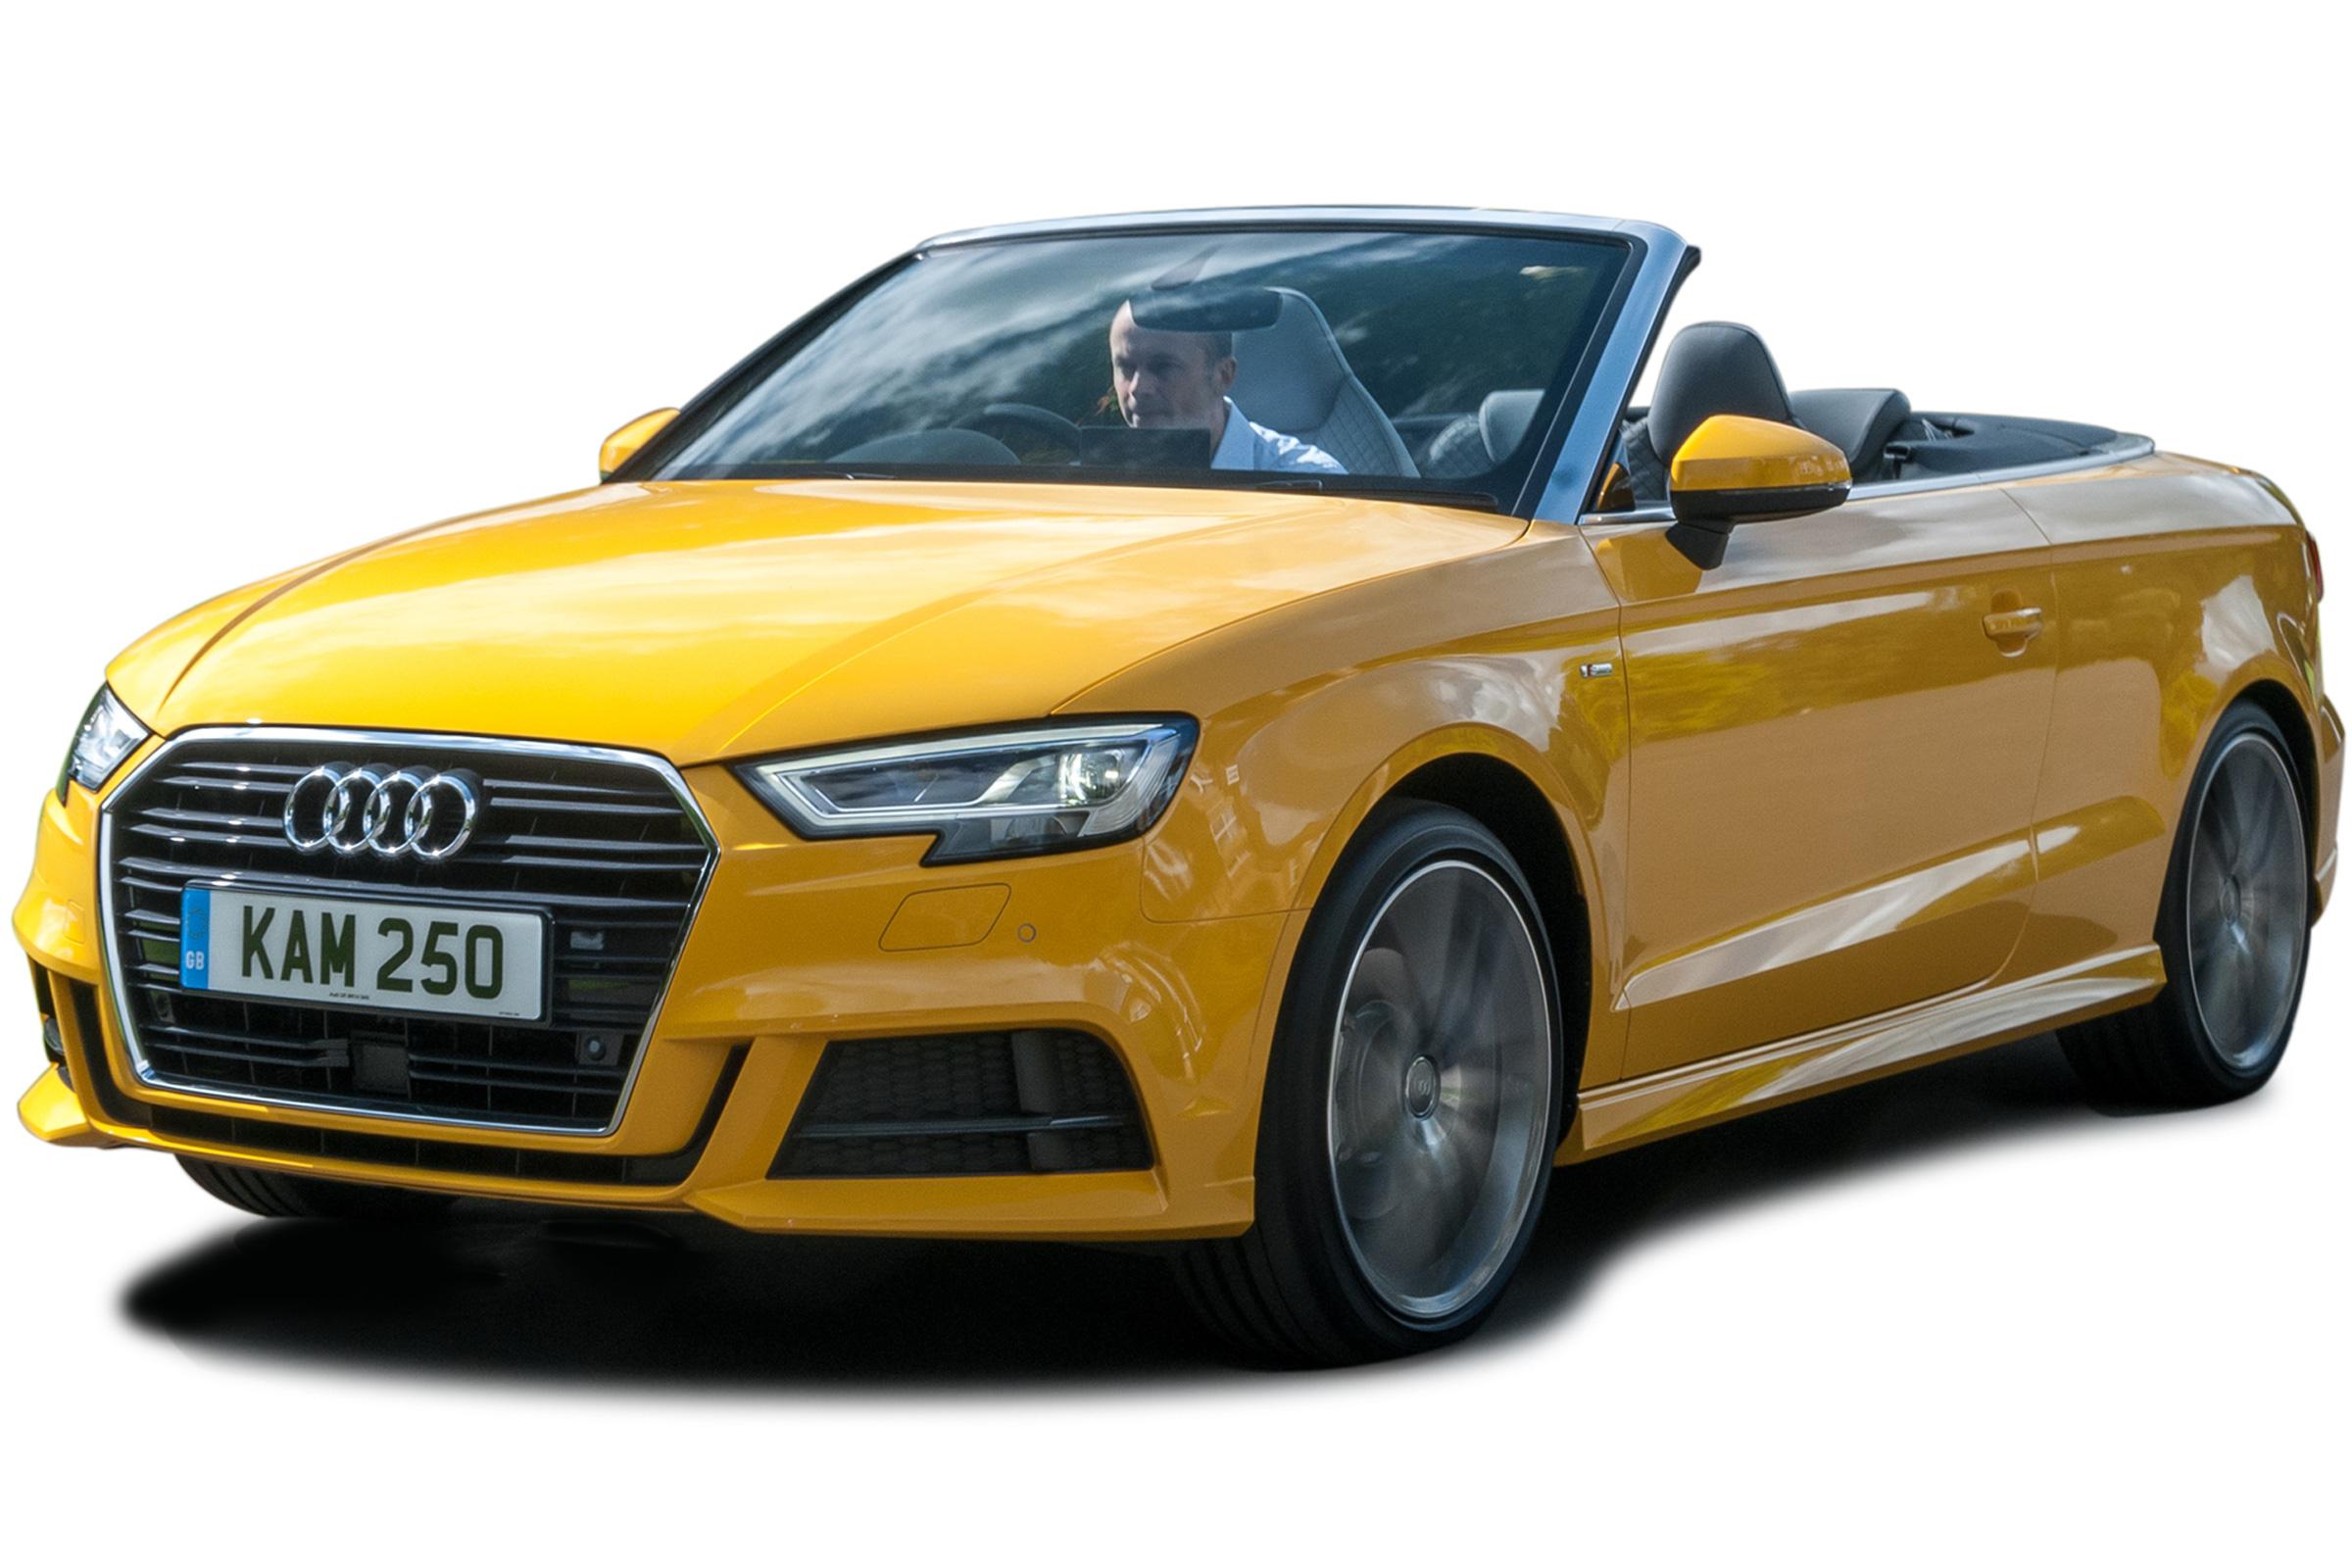 Audi A3 Cabriolet 2020 Review Carbuyer